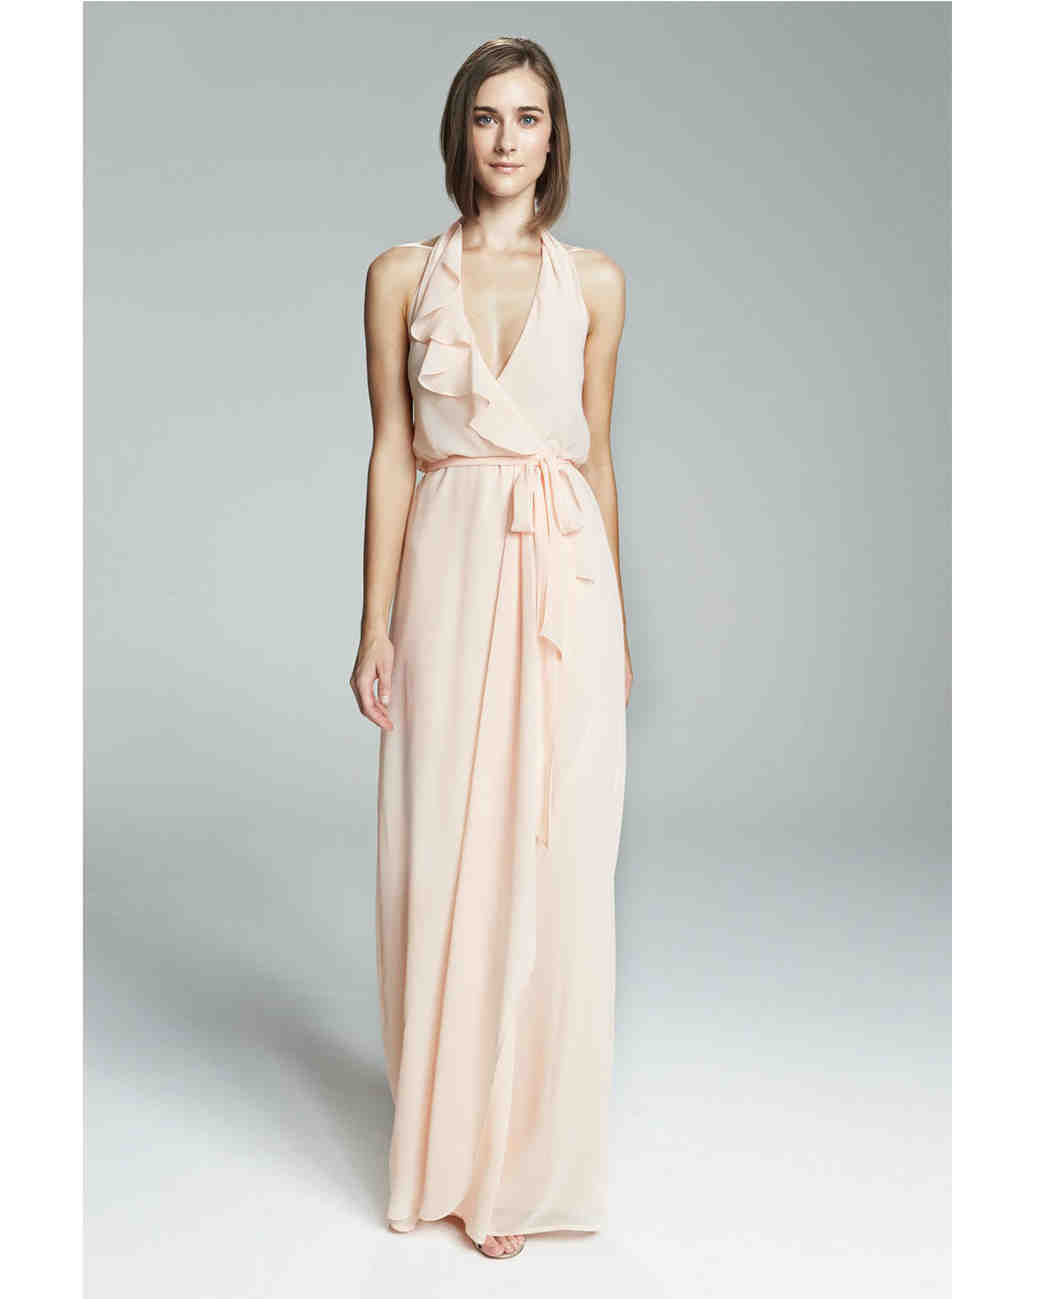 1a5b72a1fe Amsale Bridesmaid Dresses Nordstrom - Data Dynamic AG